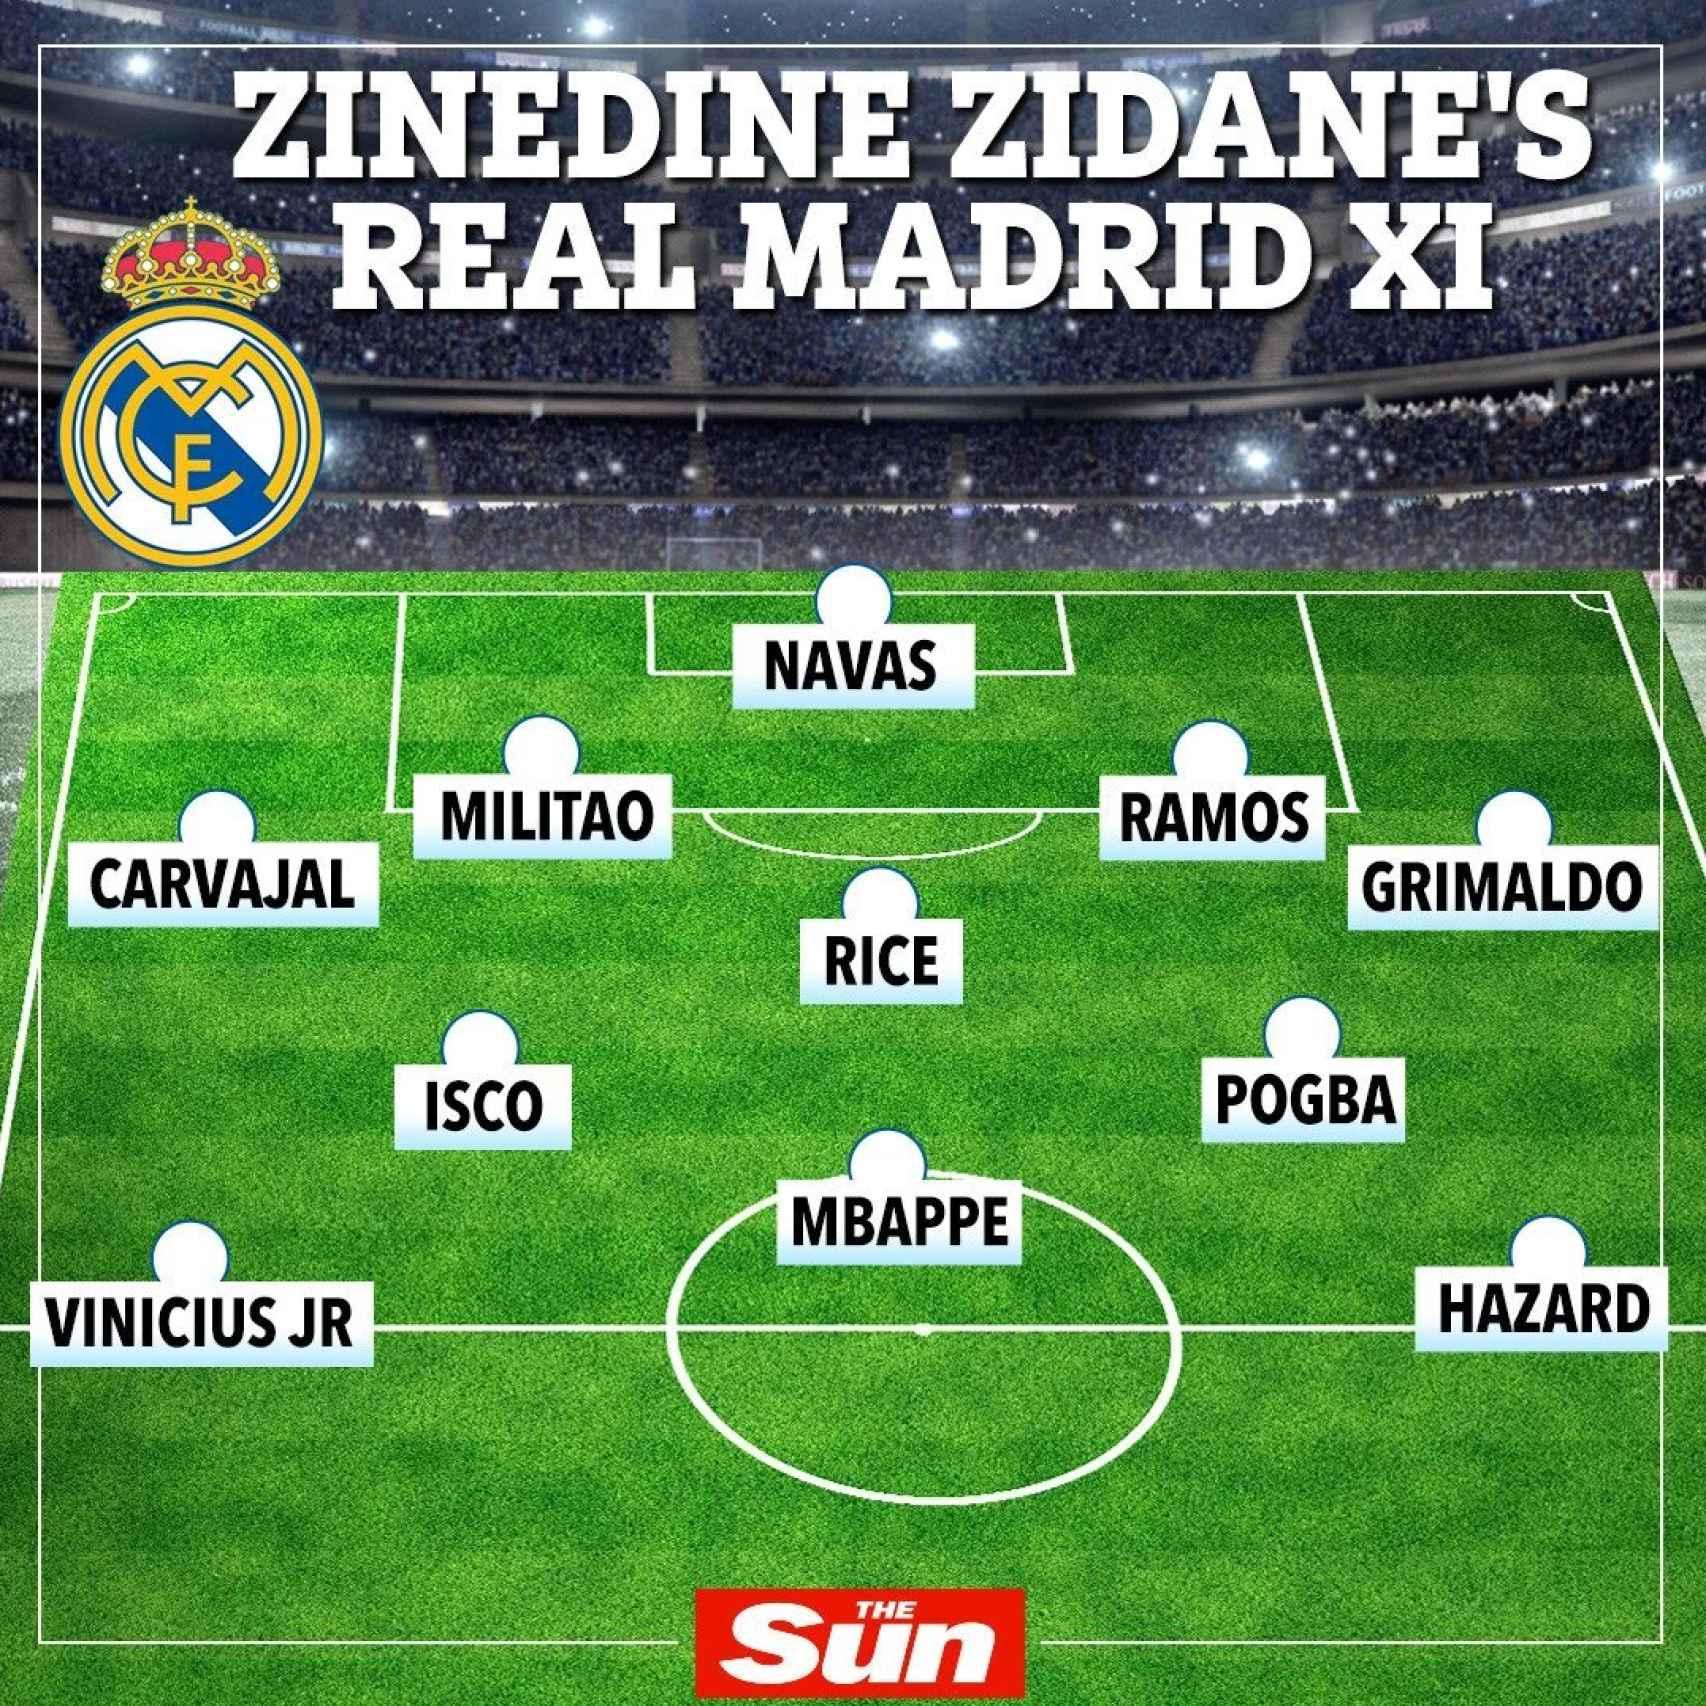 El once del Real Madrid 2019/2020, según The Sun